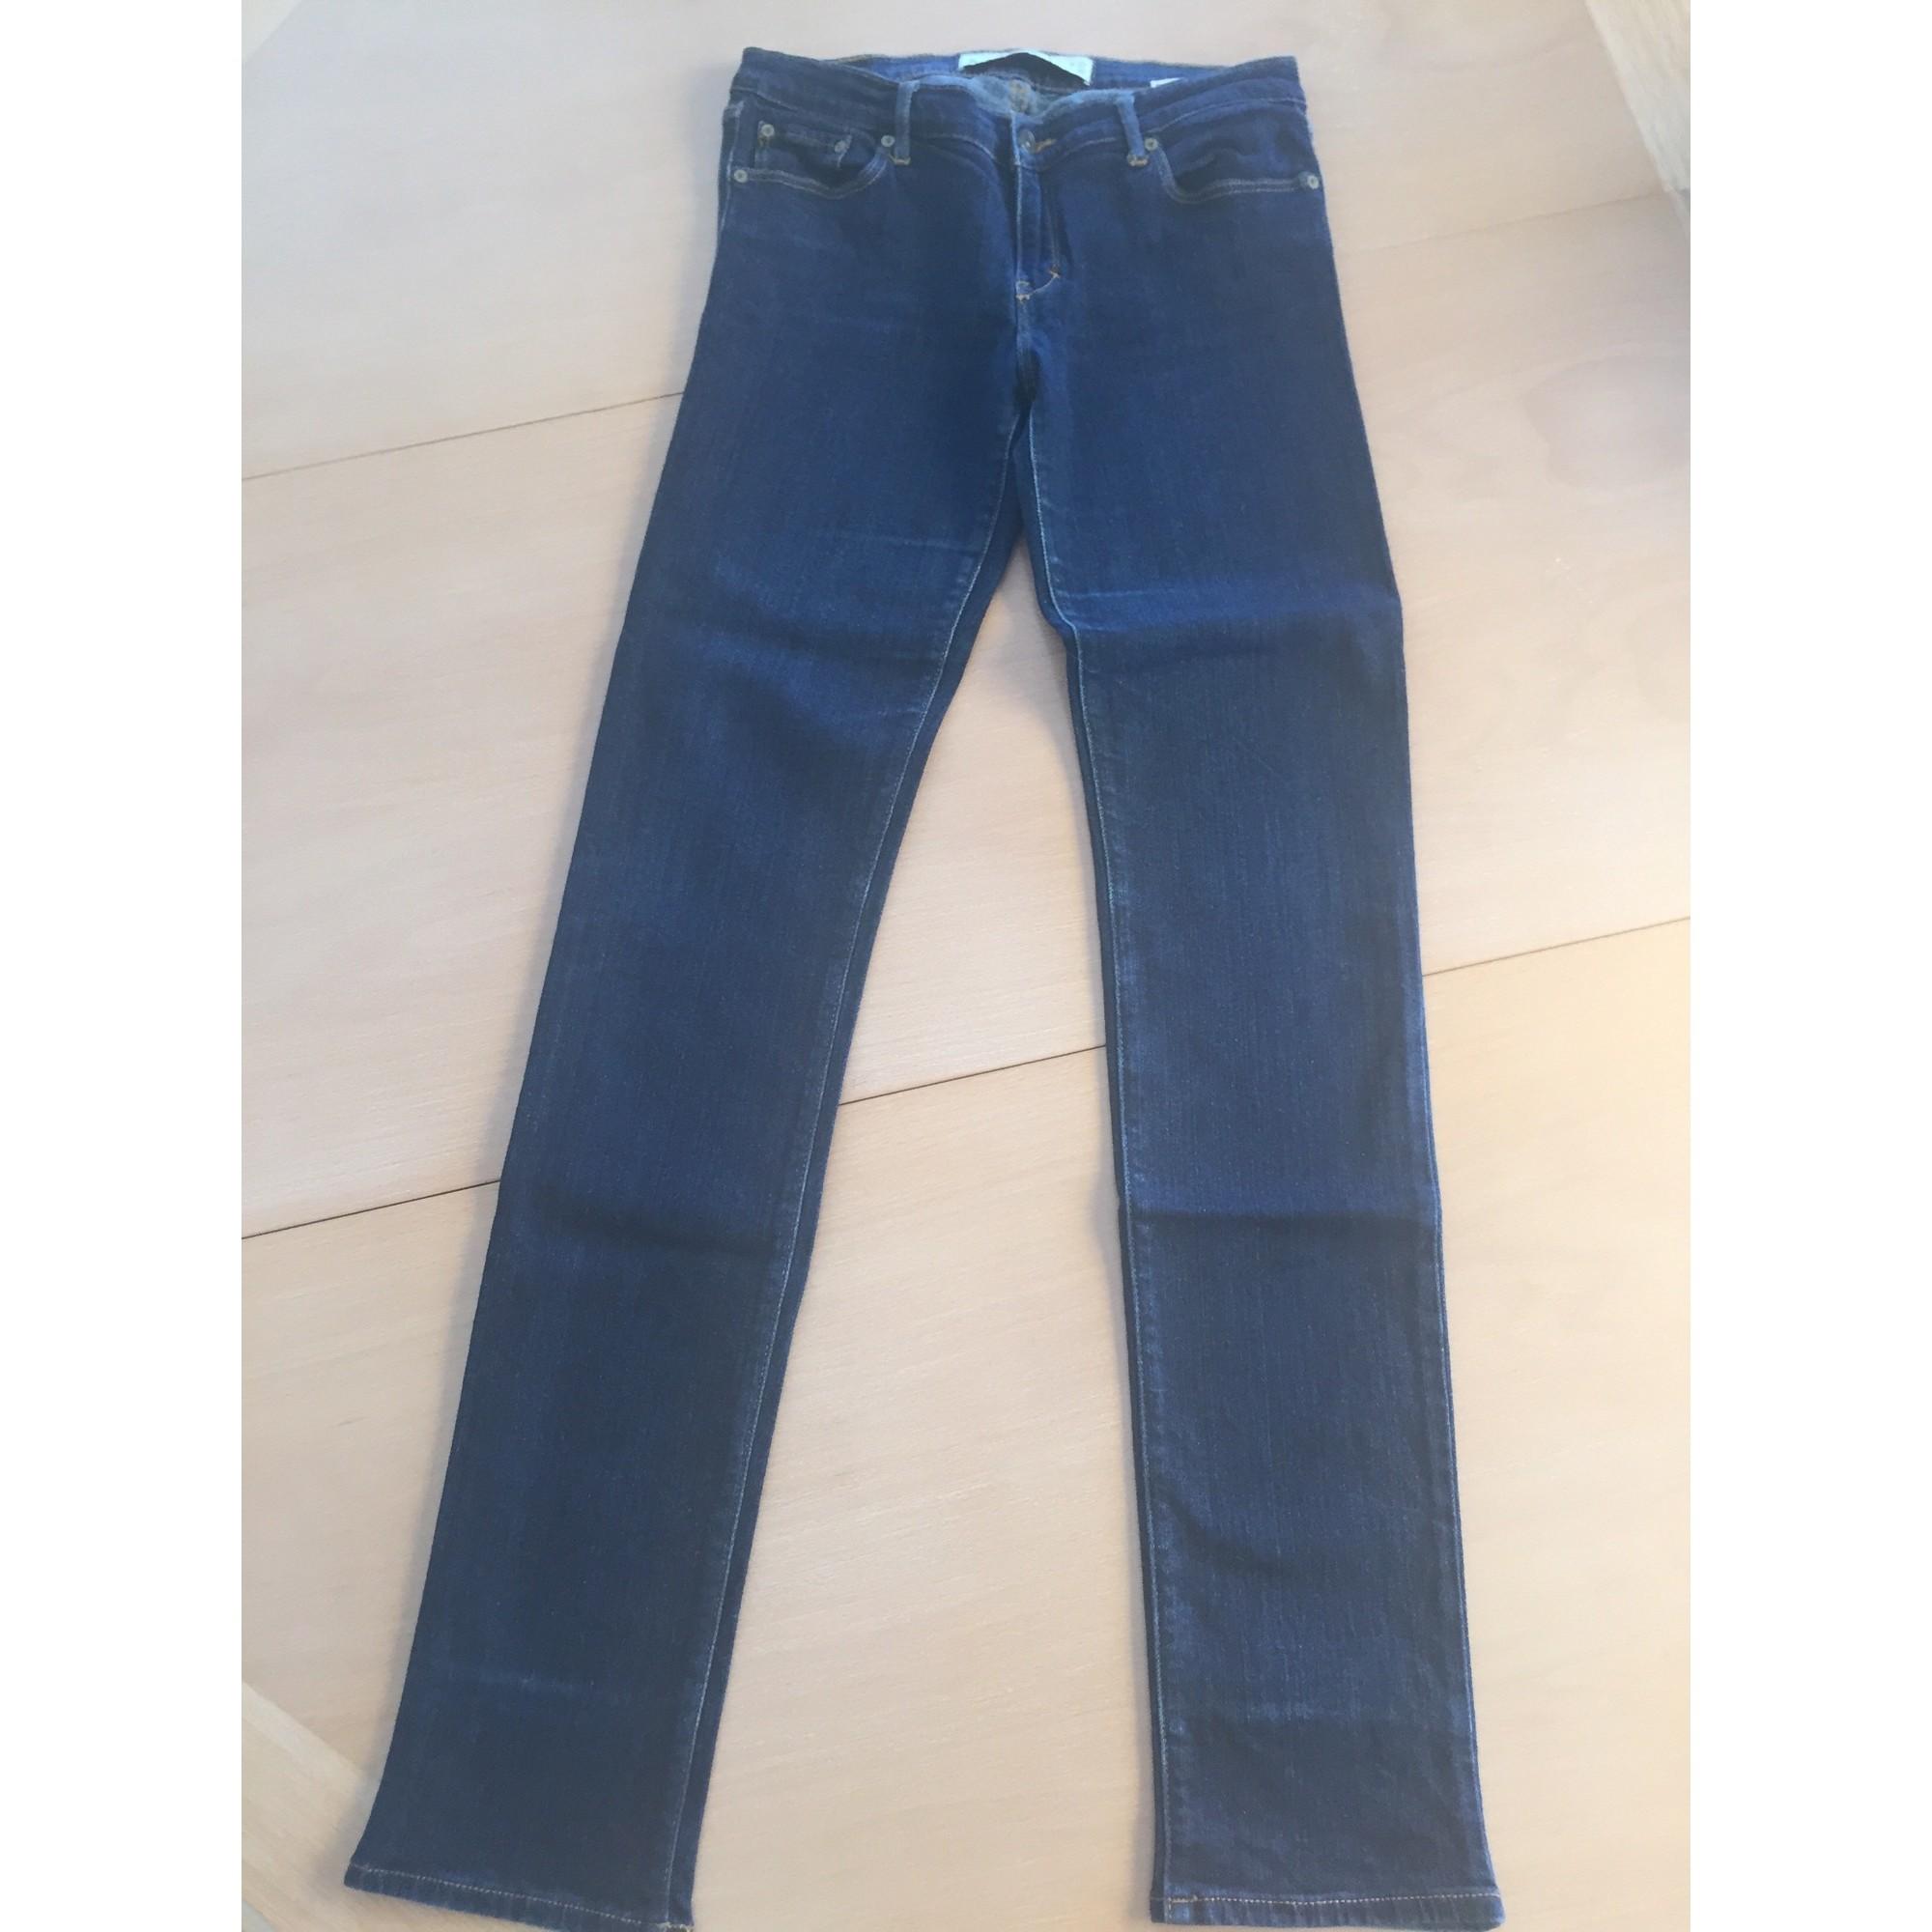 Jeans droit ABERCROMBIE & FITCH Bleu, bleu marine, bleu turquoise